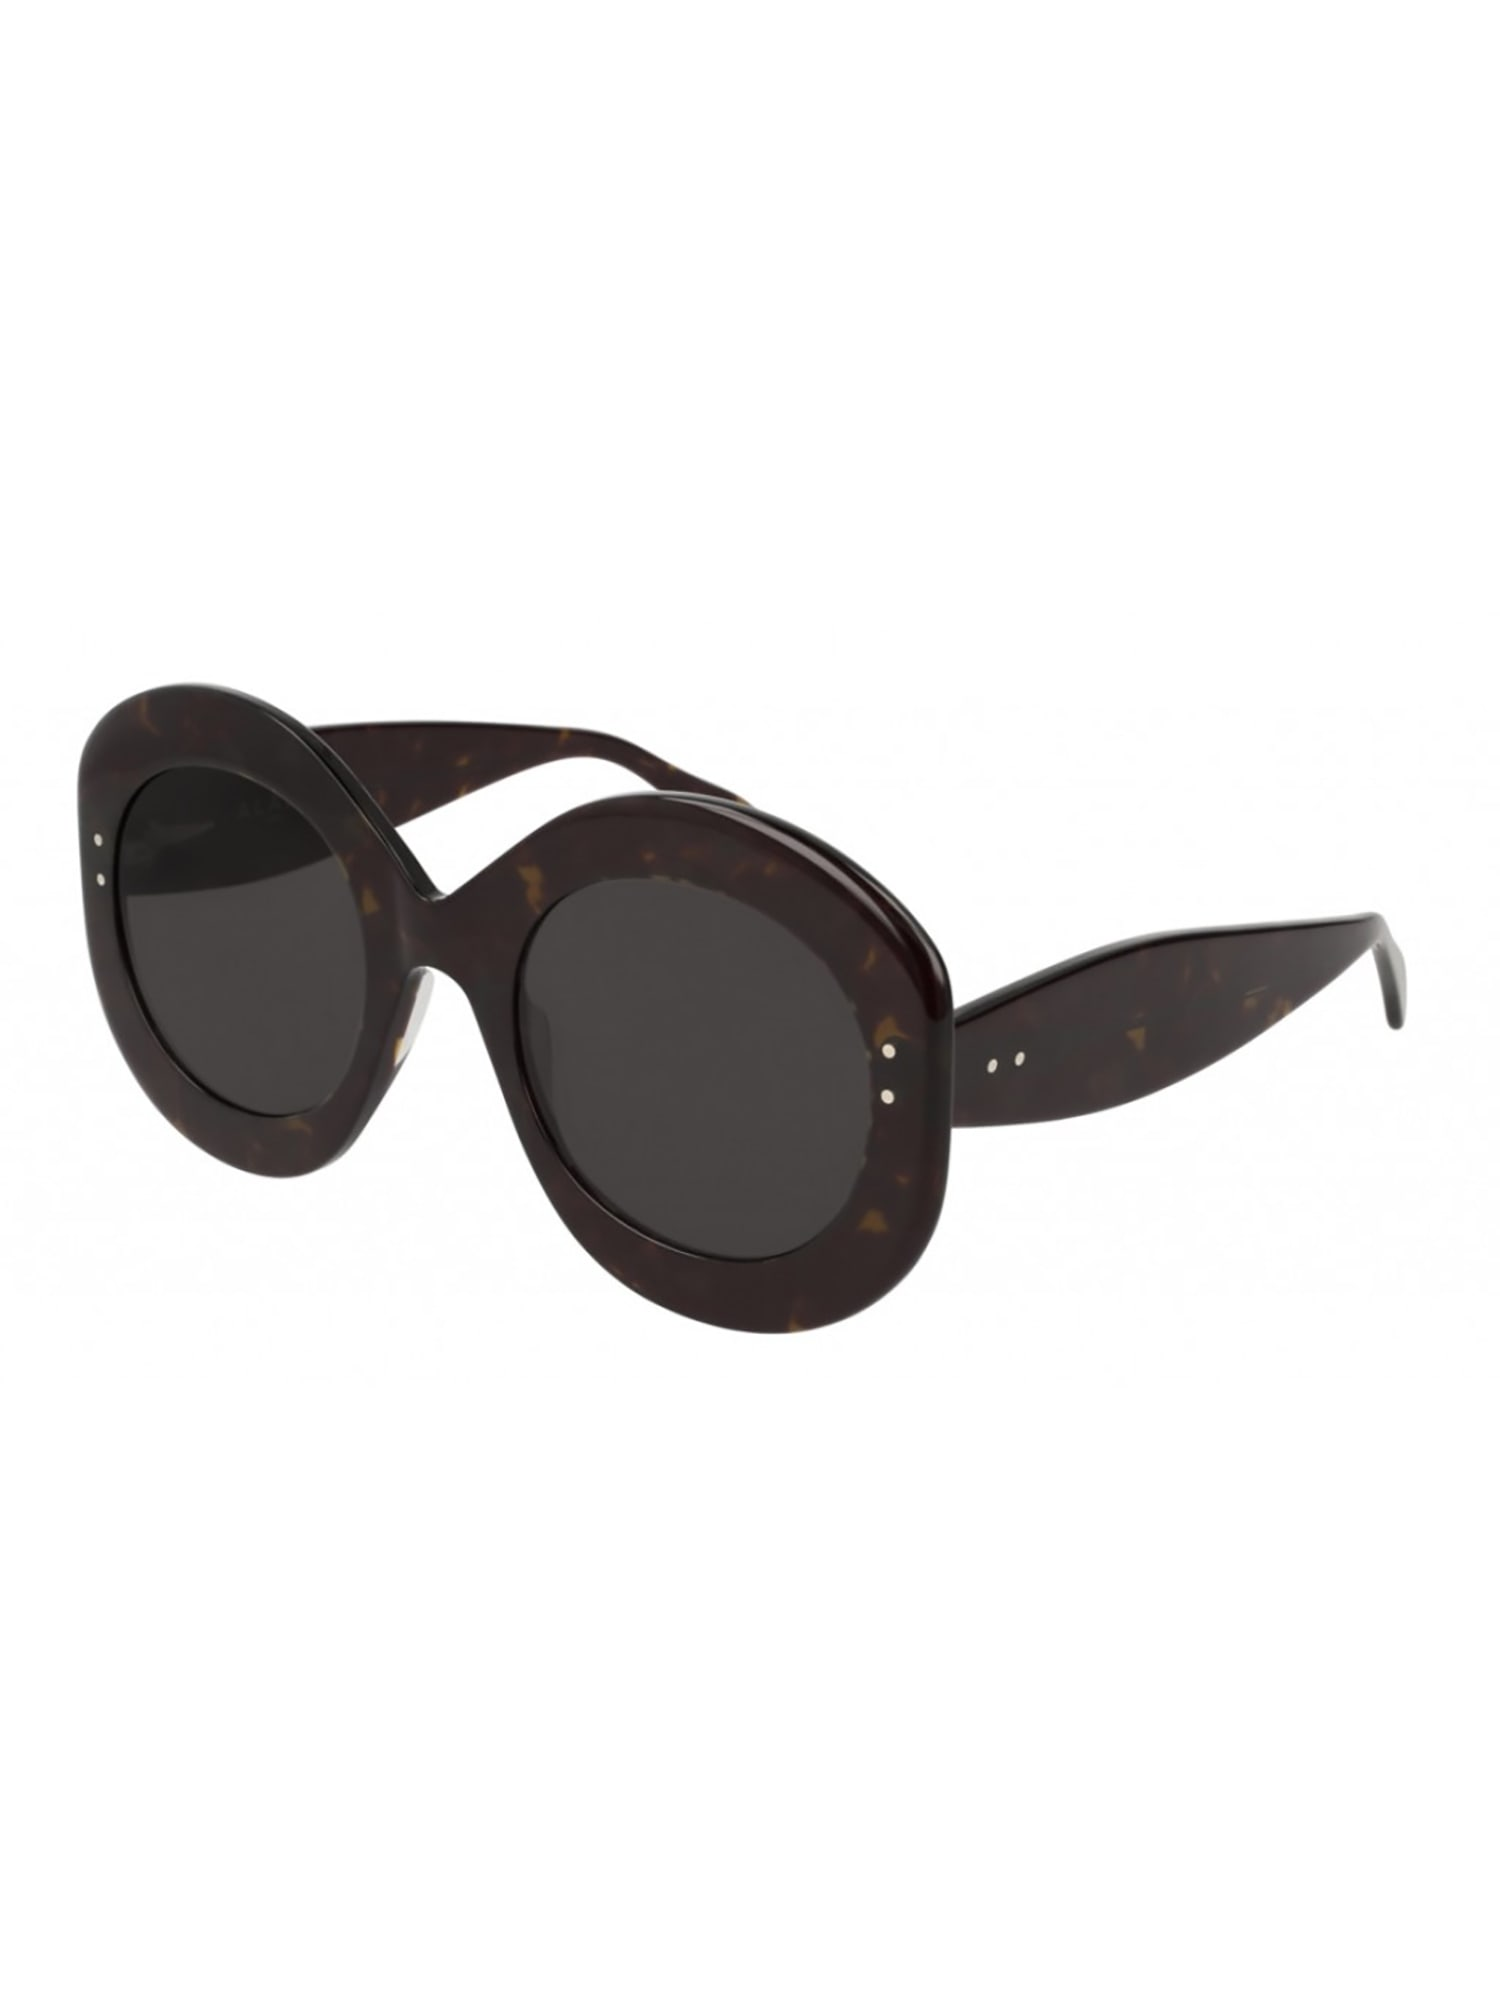 Alaïa Aa0003s Sunglasses In Havana Havana Grey